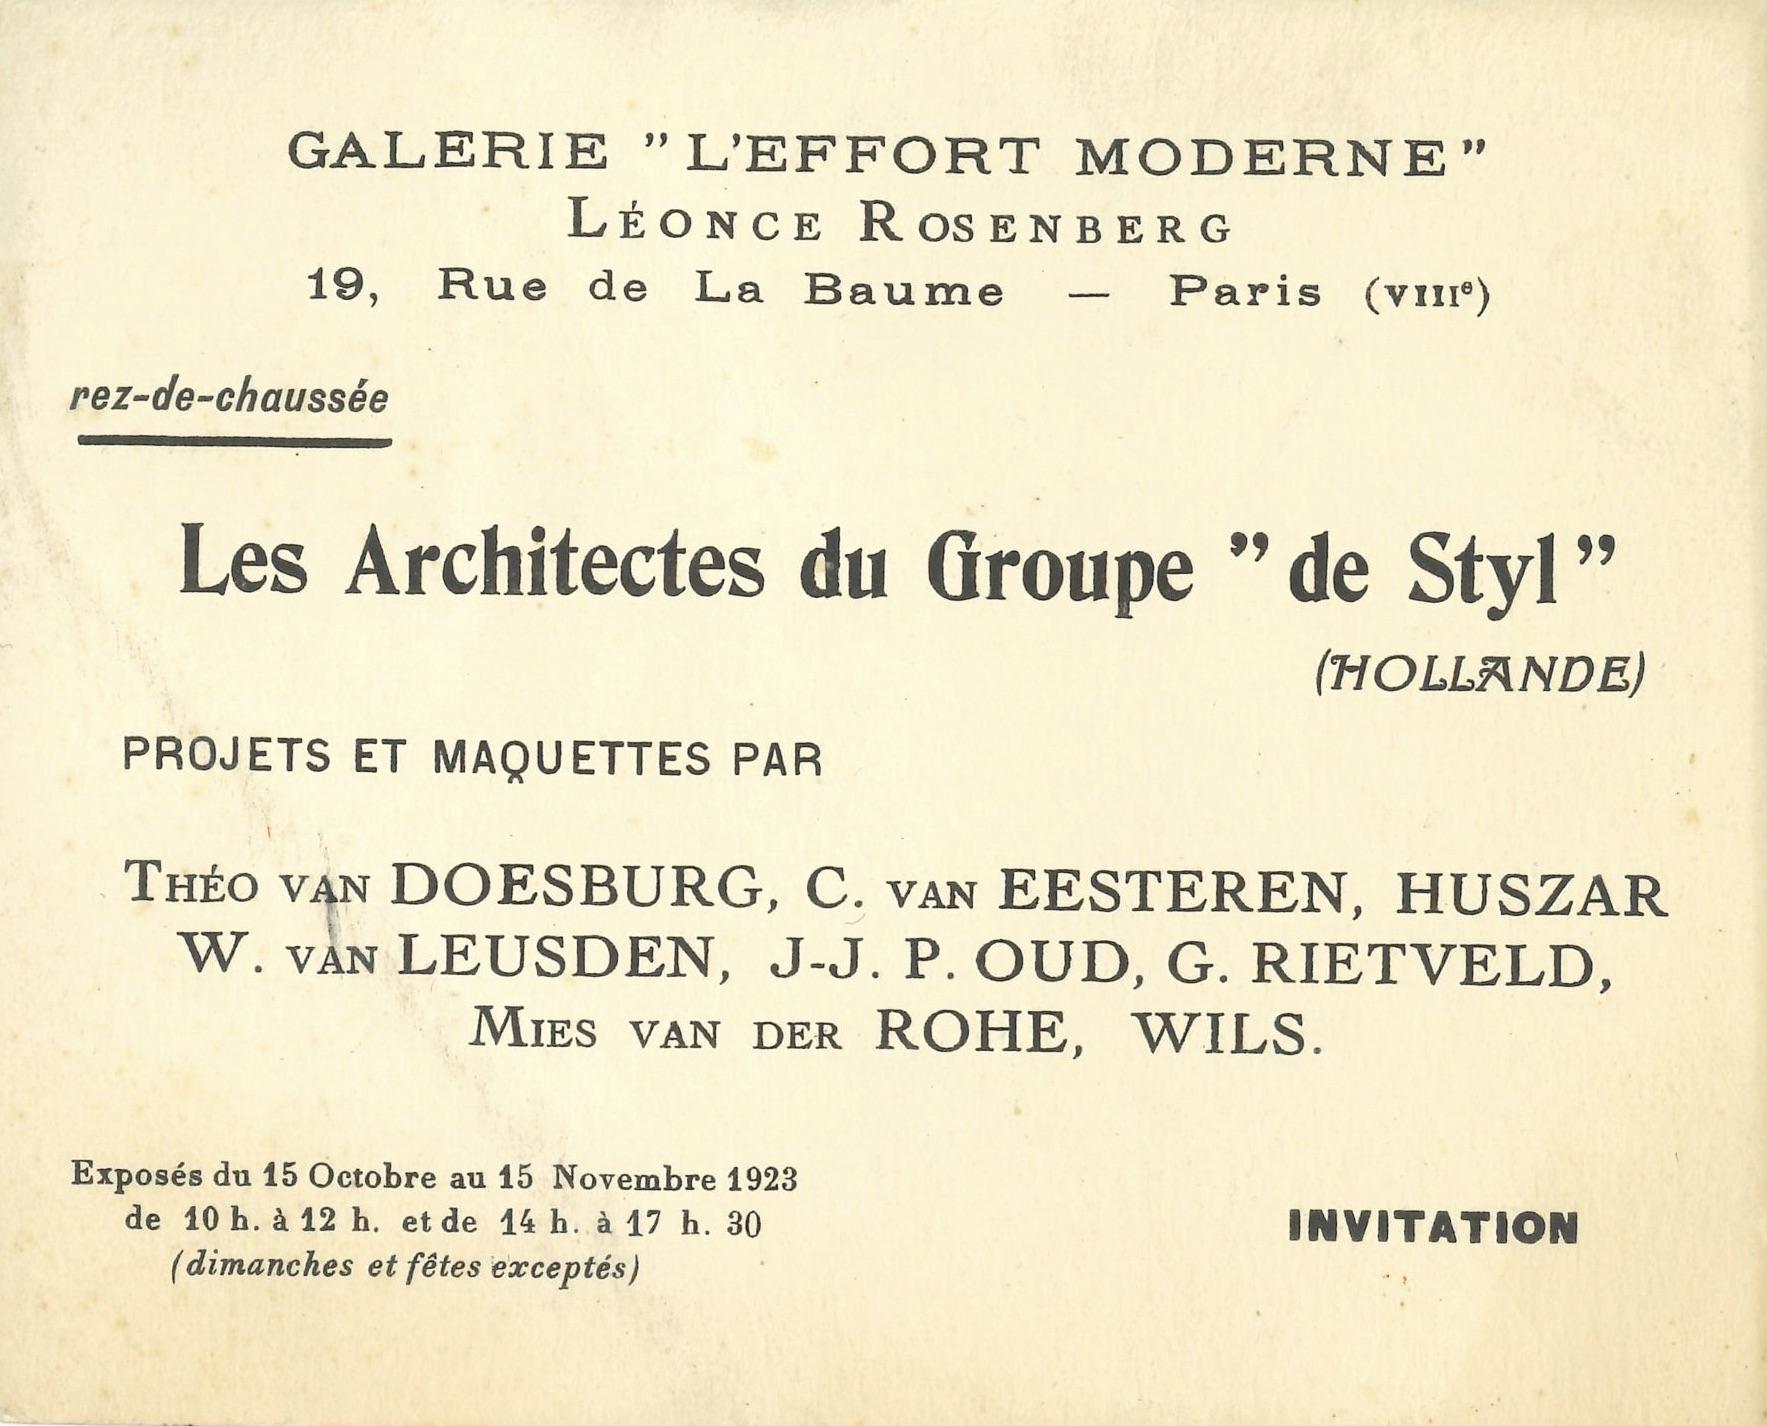 "LES ARCHITECTES DU GROUPE ""DE STYL"", Galerie L'Effort Moderne, Paris 1923 (invitation) Archiv der Avantgarden, Staatliche Kunstsammlungen Dresden"